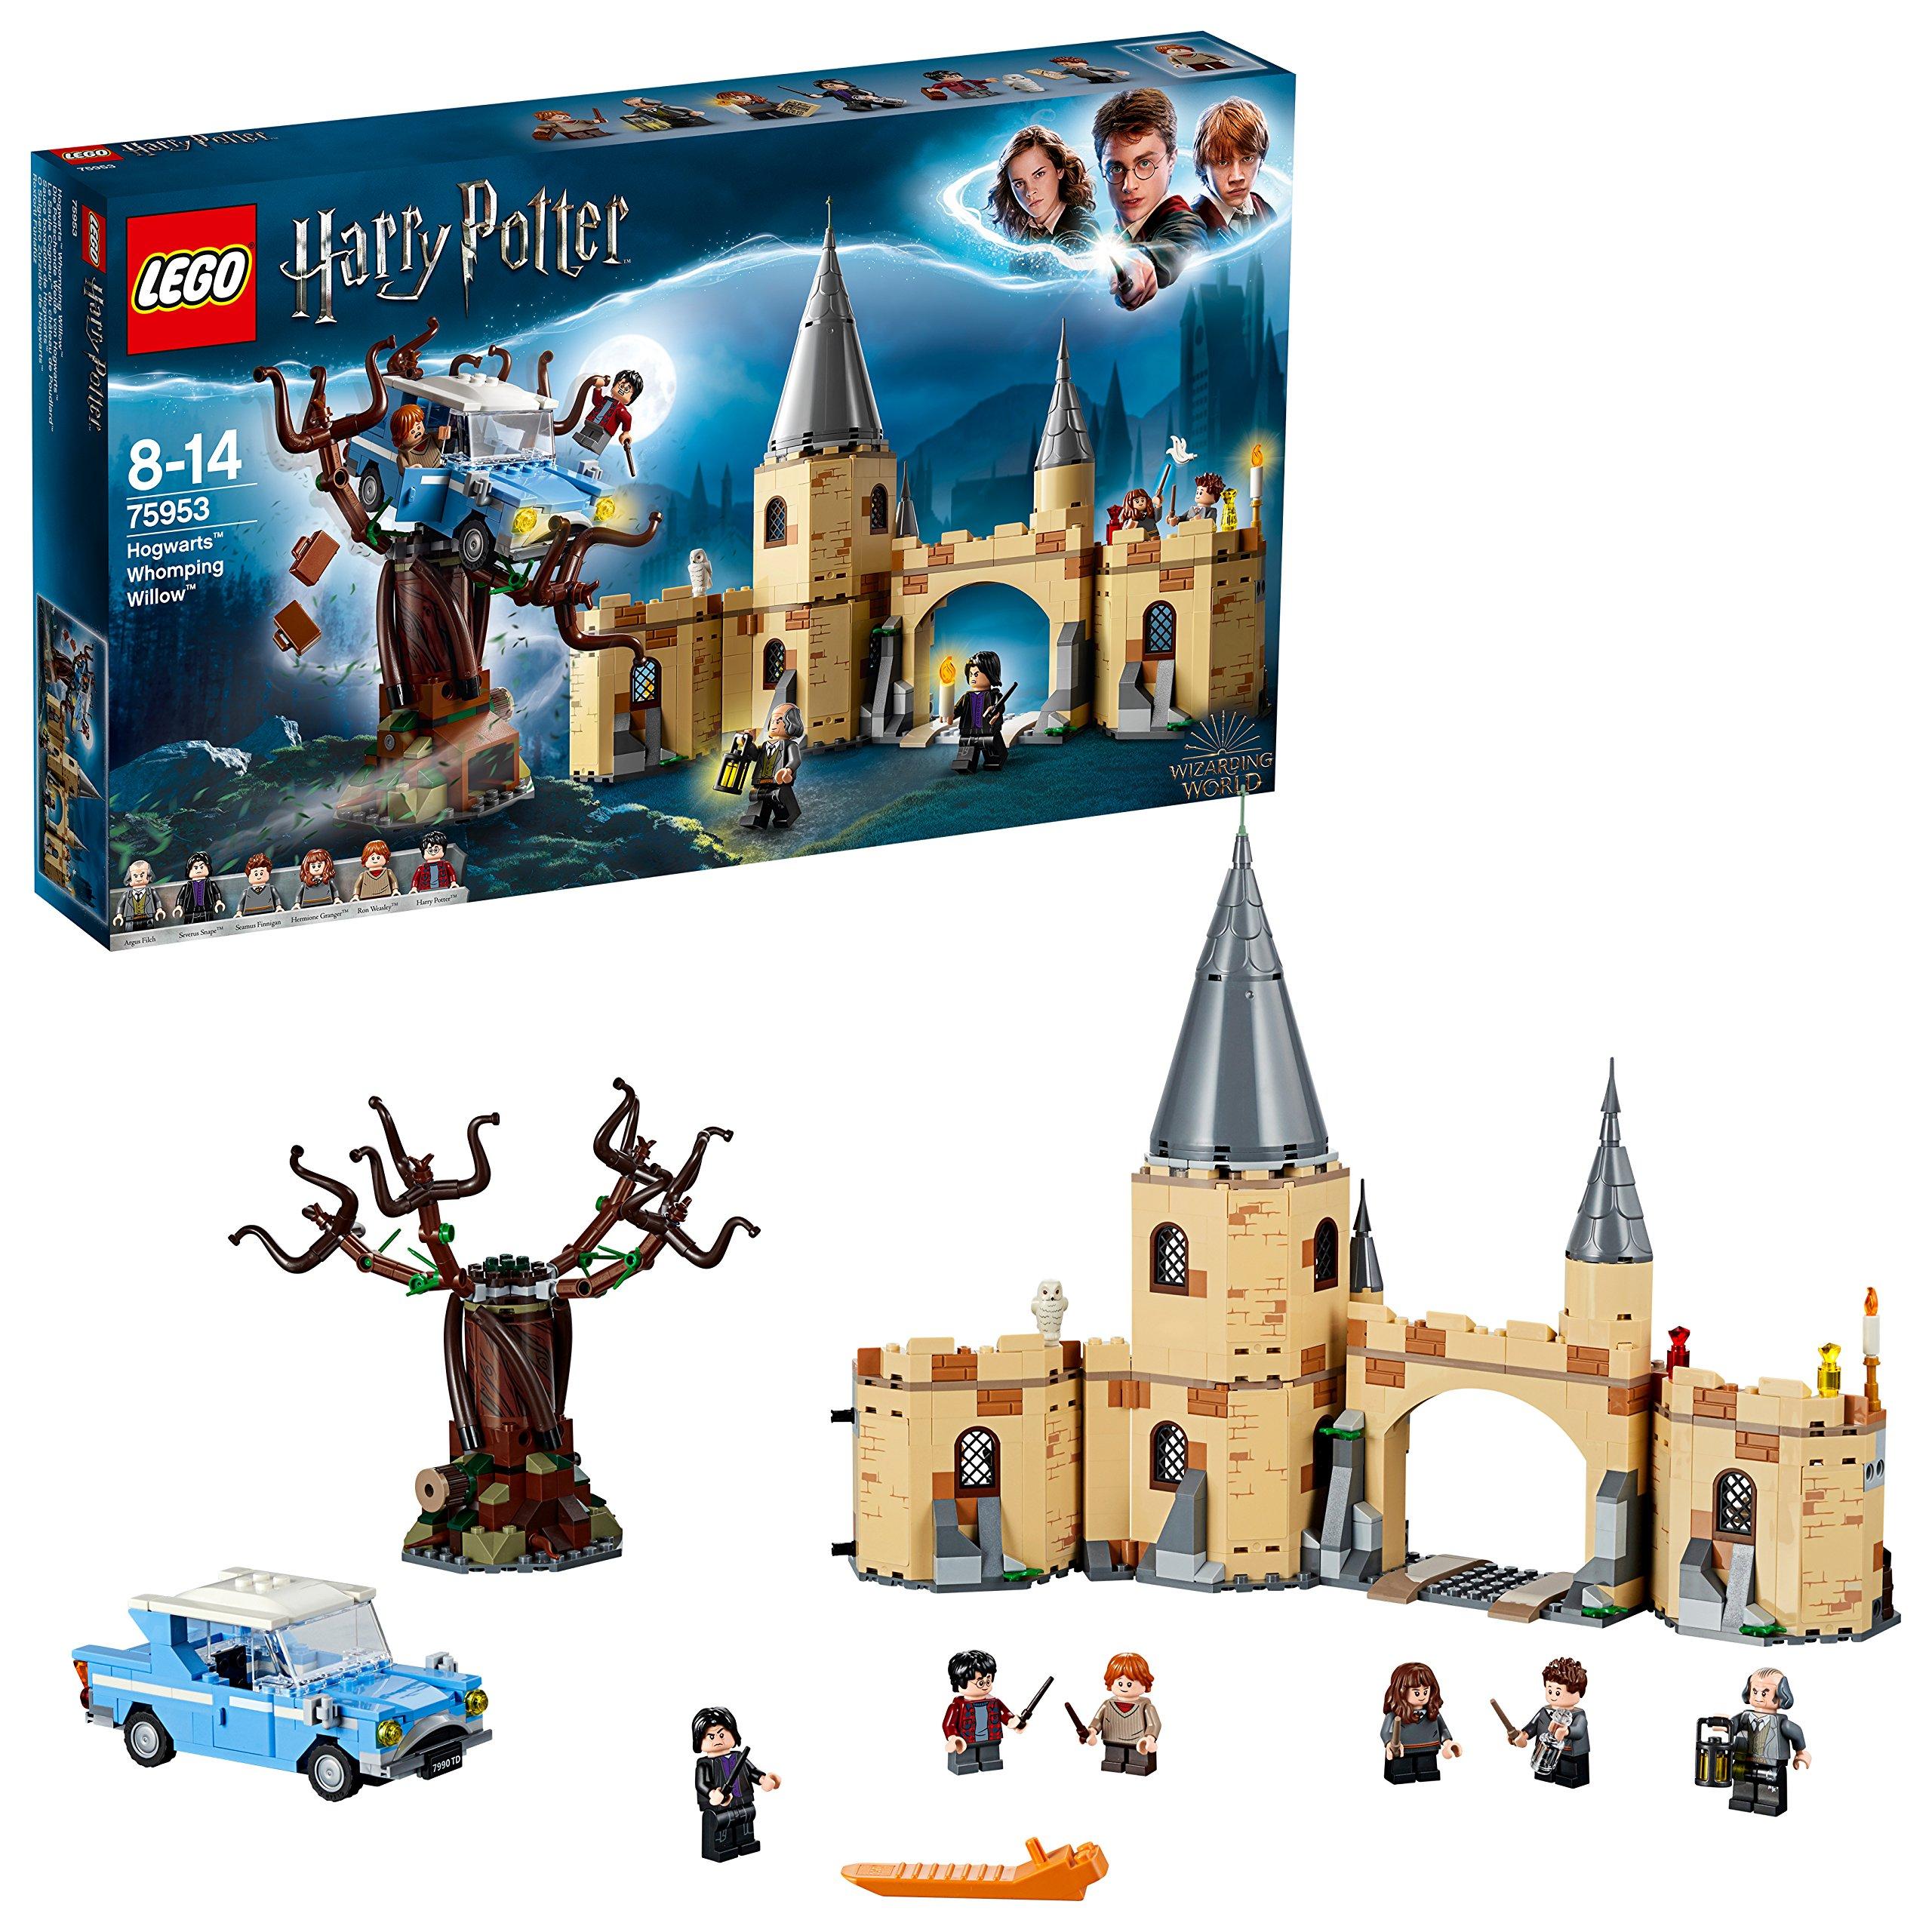 LEGO Harry Potter – Sauce Boxeador de Hogwarts, Juguete de Construcción del Mundo Mágico con Minifiguras de Harry Potter…